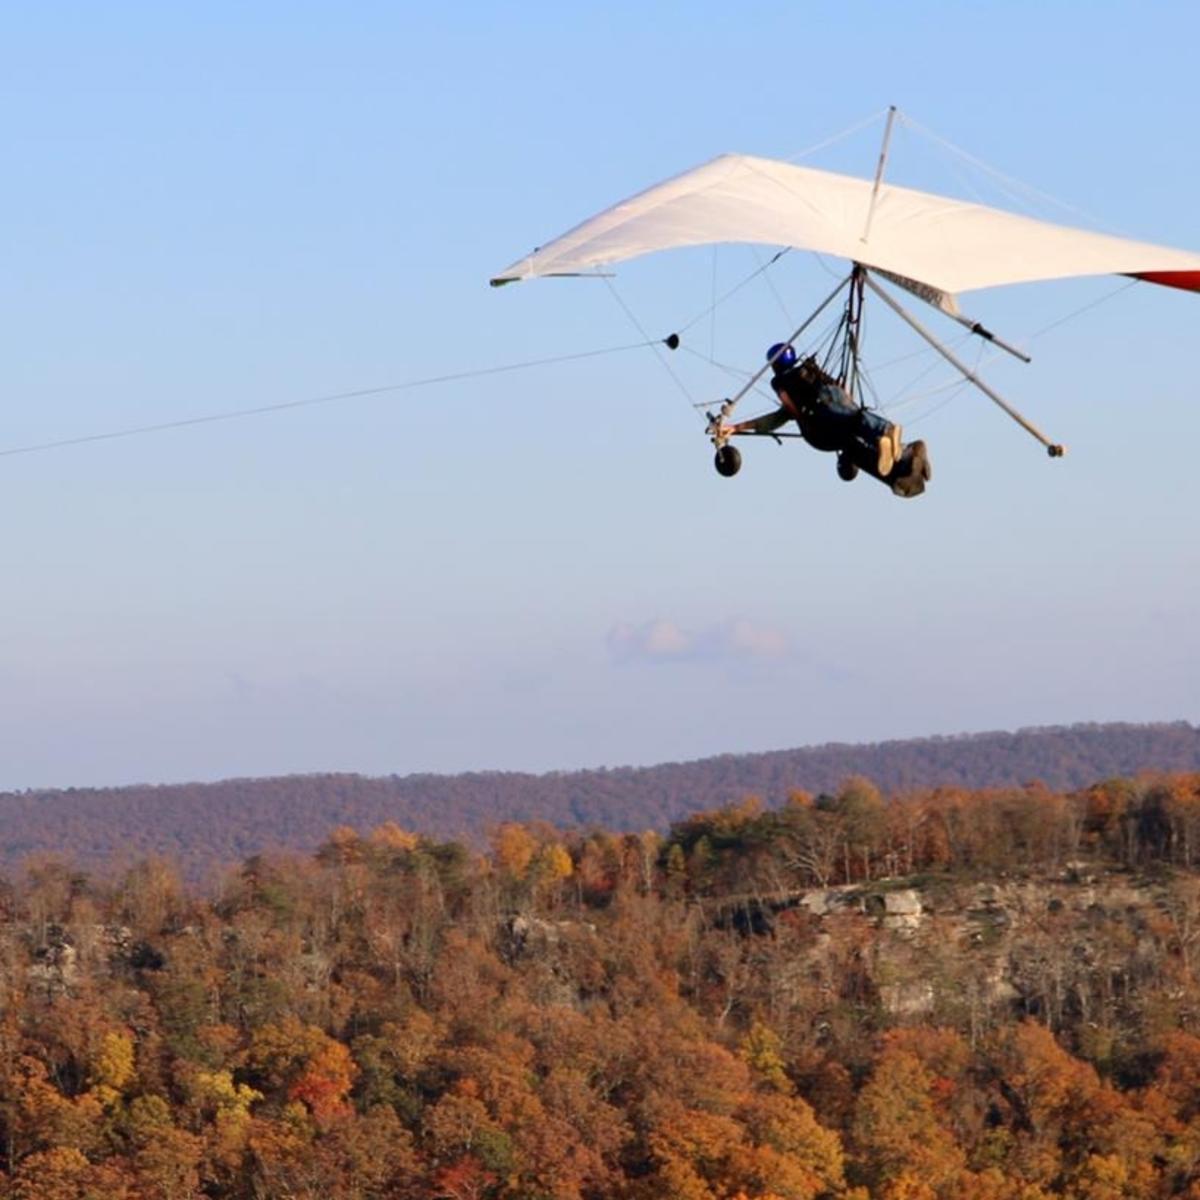 Lookout Mountain Hang Gliding_Fall